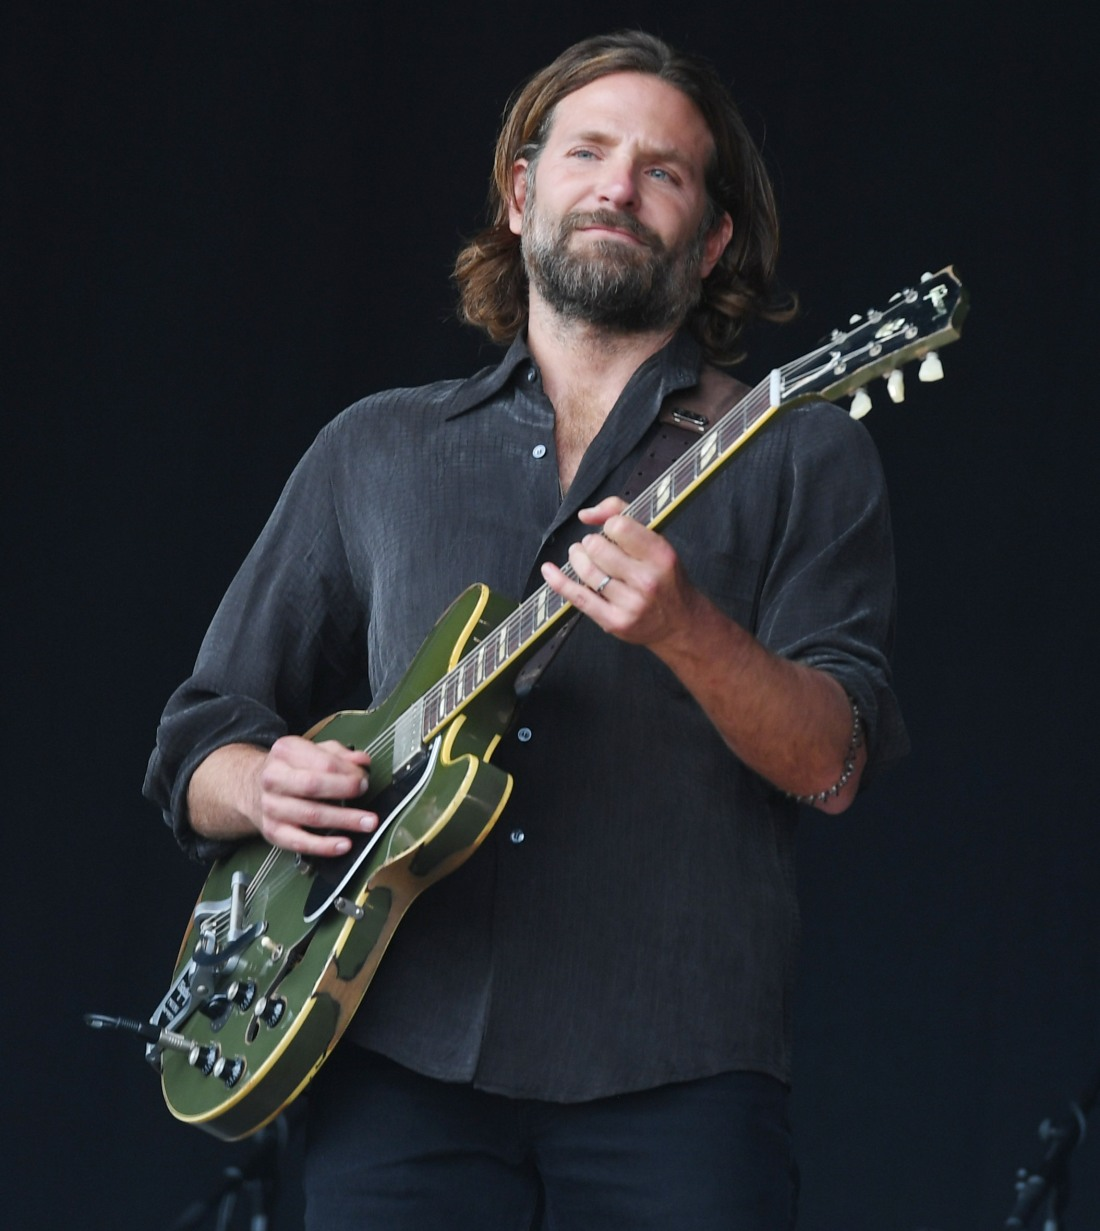 Glastonbury Festival 2017 - Day 3 - Performances